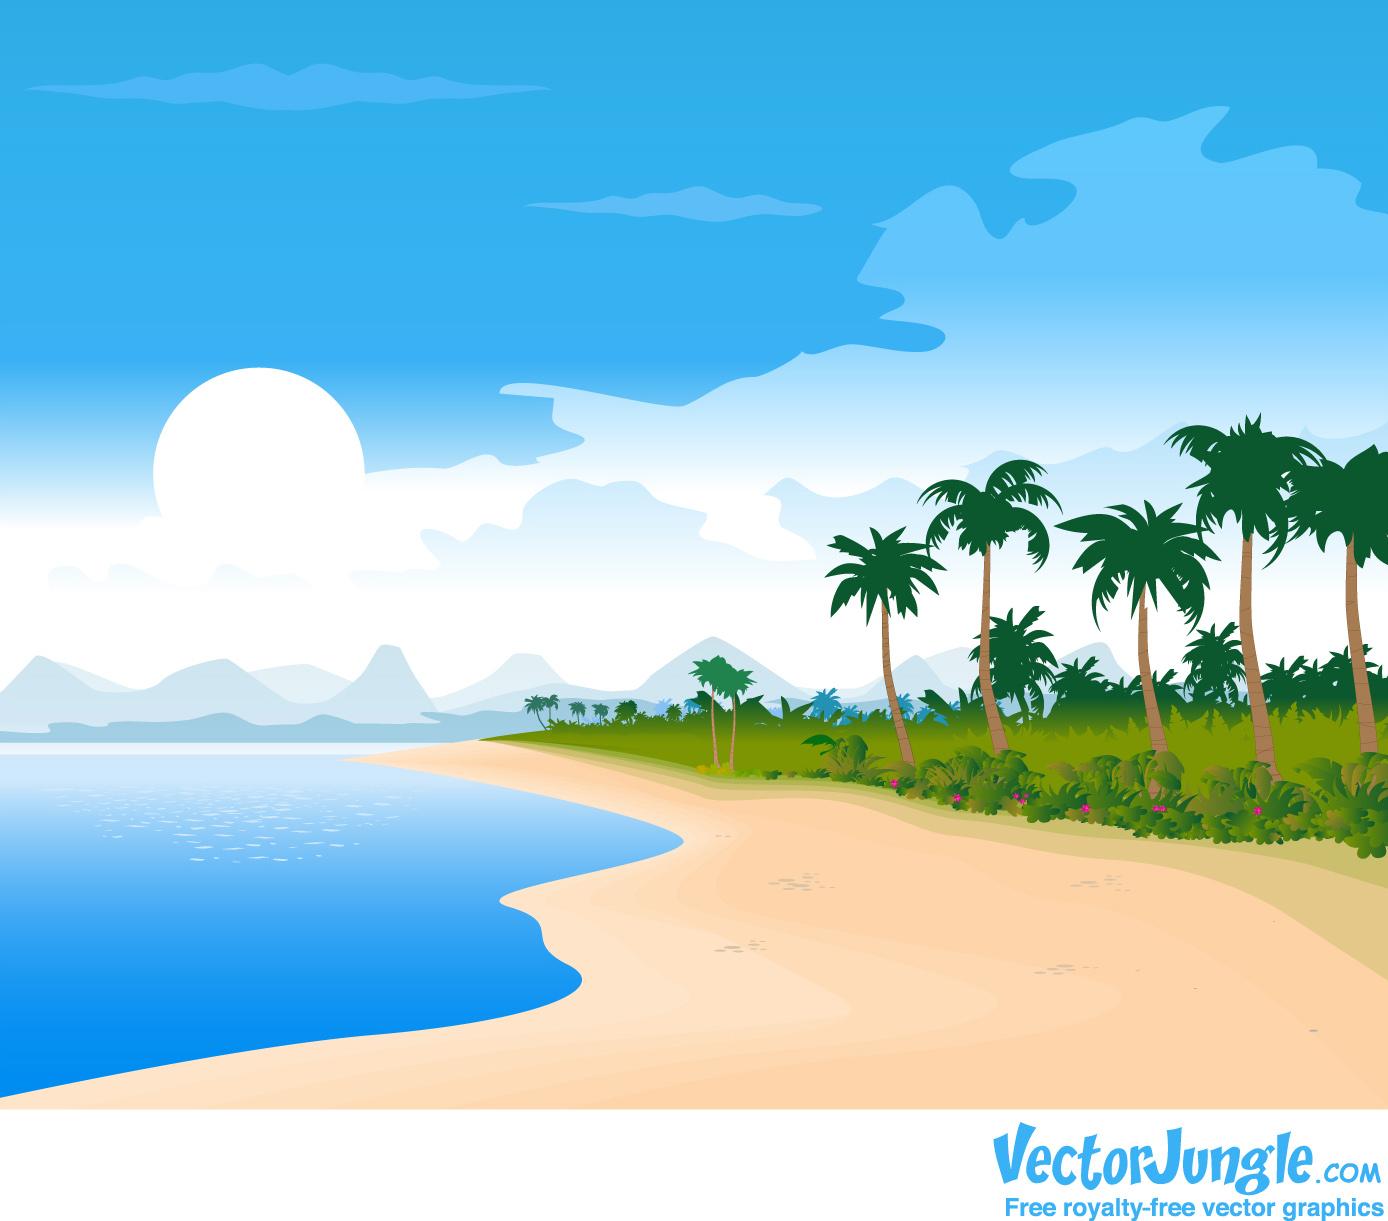 Download Cartoon Beach Wallpaper in high resolution for High 1388x1221